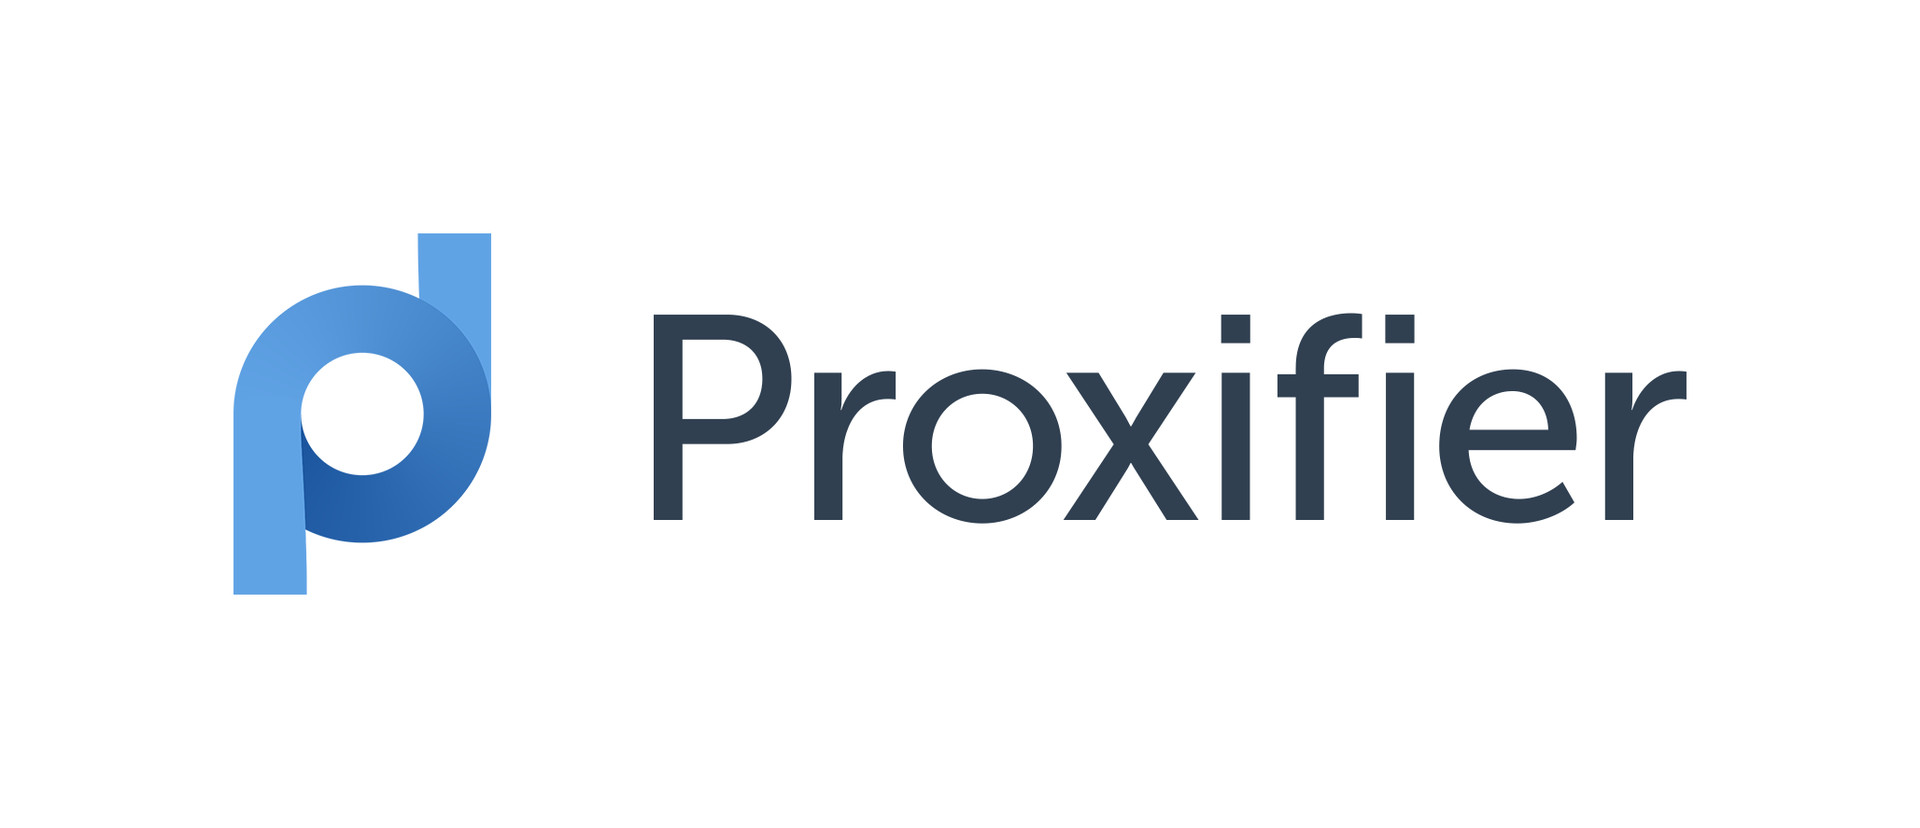 Proxifier 2020 Registration Key + Crack Free Download {Updated Version}